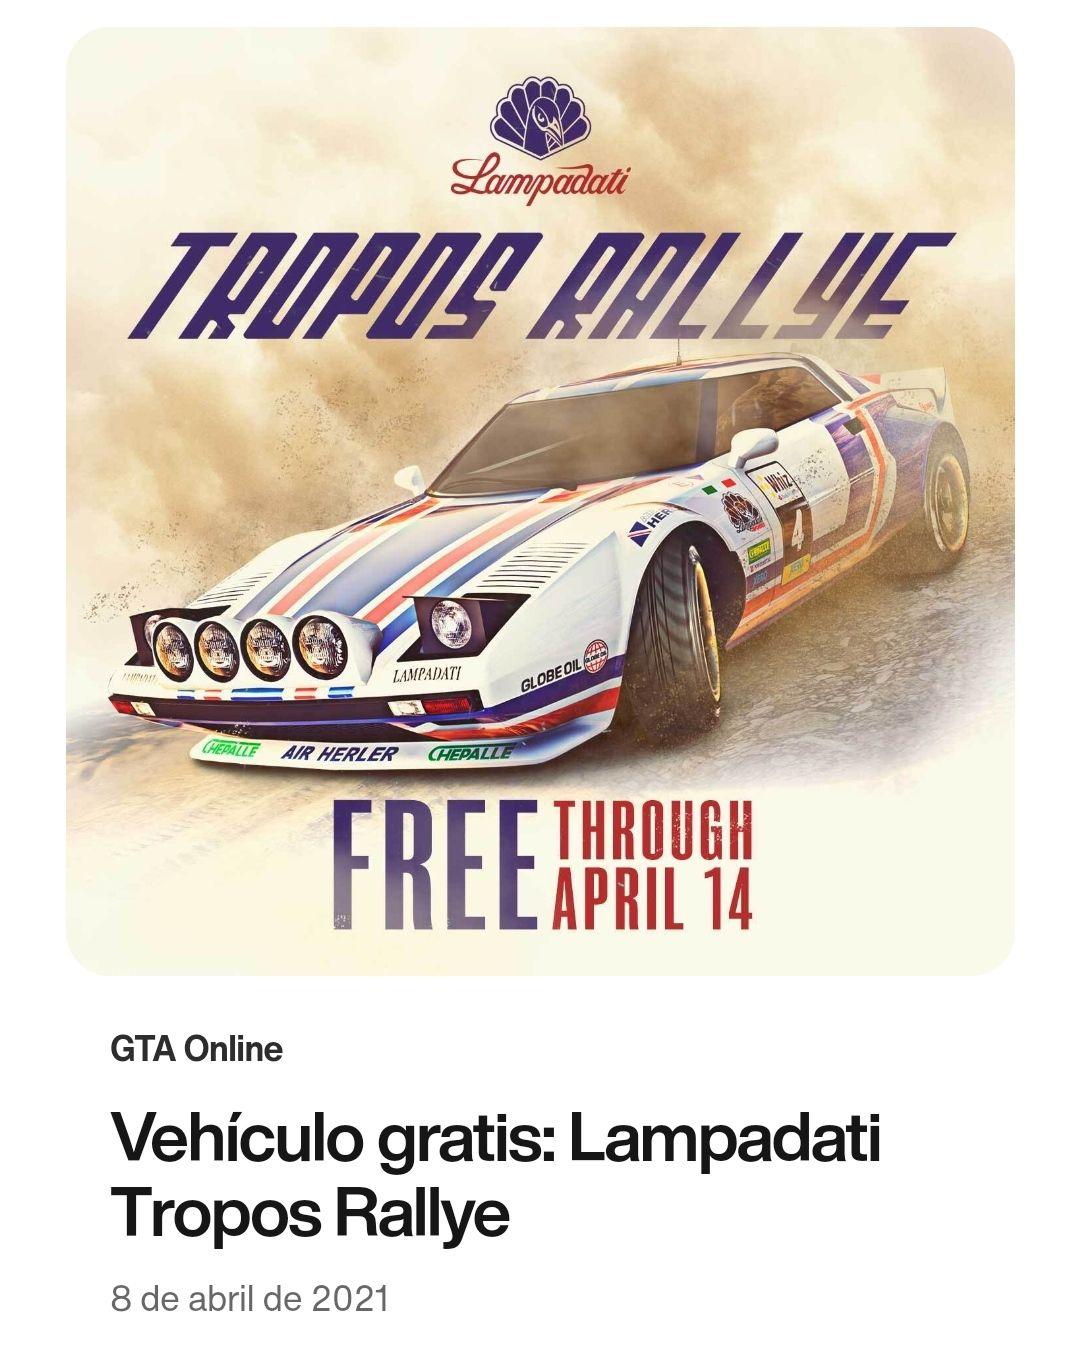 Grand Theft Auto V: Coche GRATIS (Tropos Rallye)